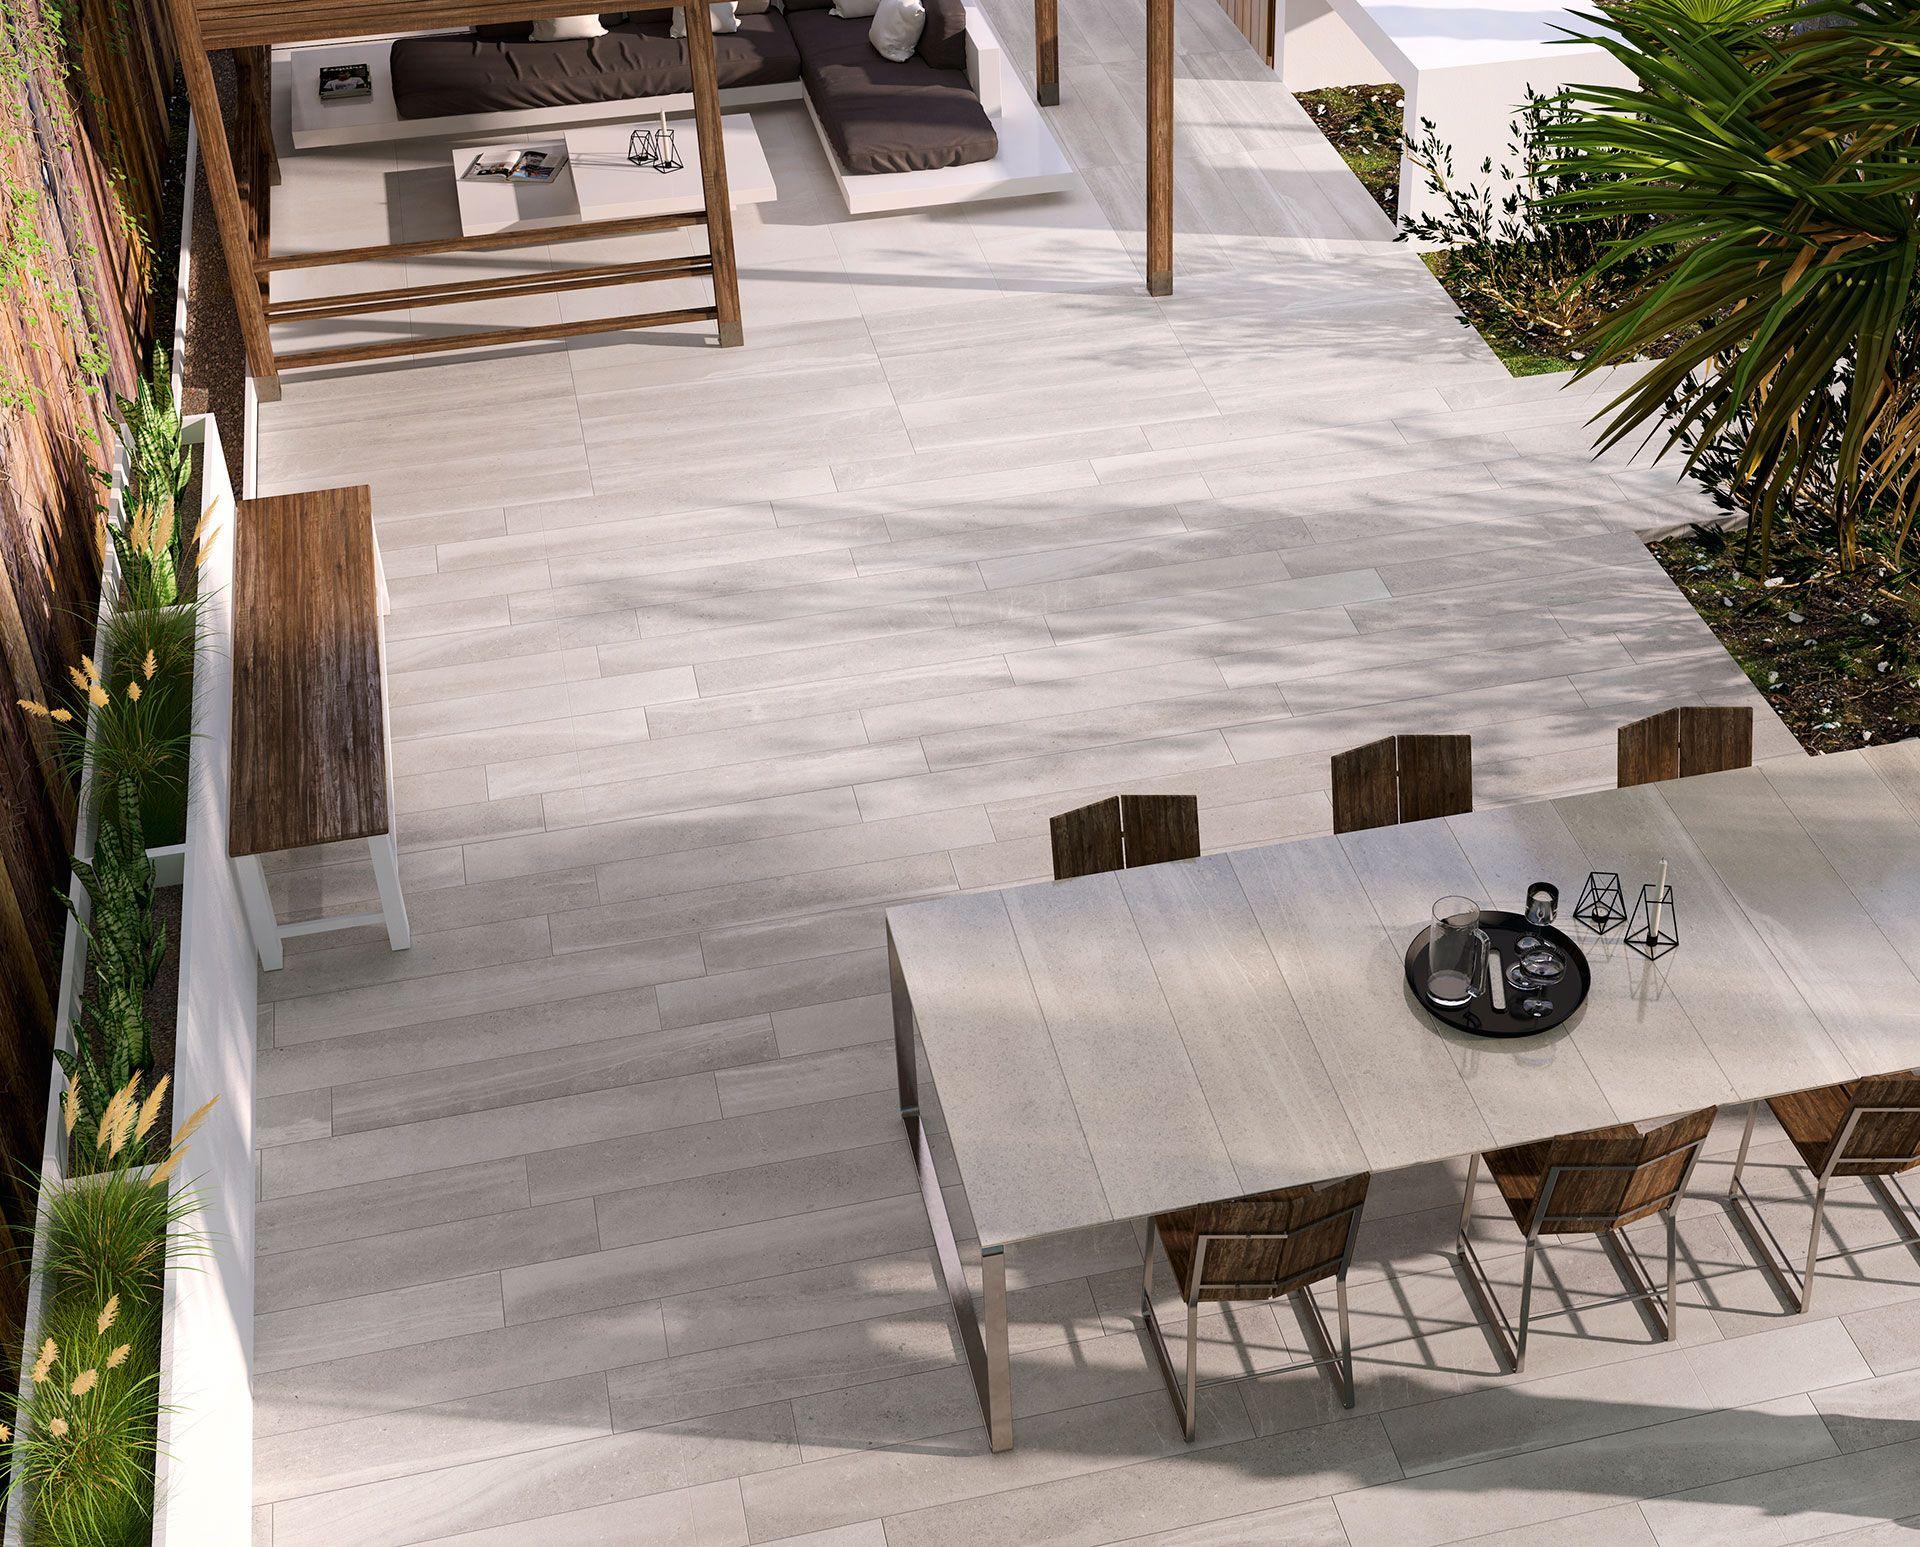 IRIS Ceramica porcelain outdoor pavements Bianco e Cemento